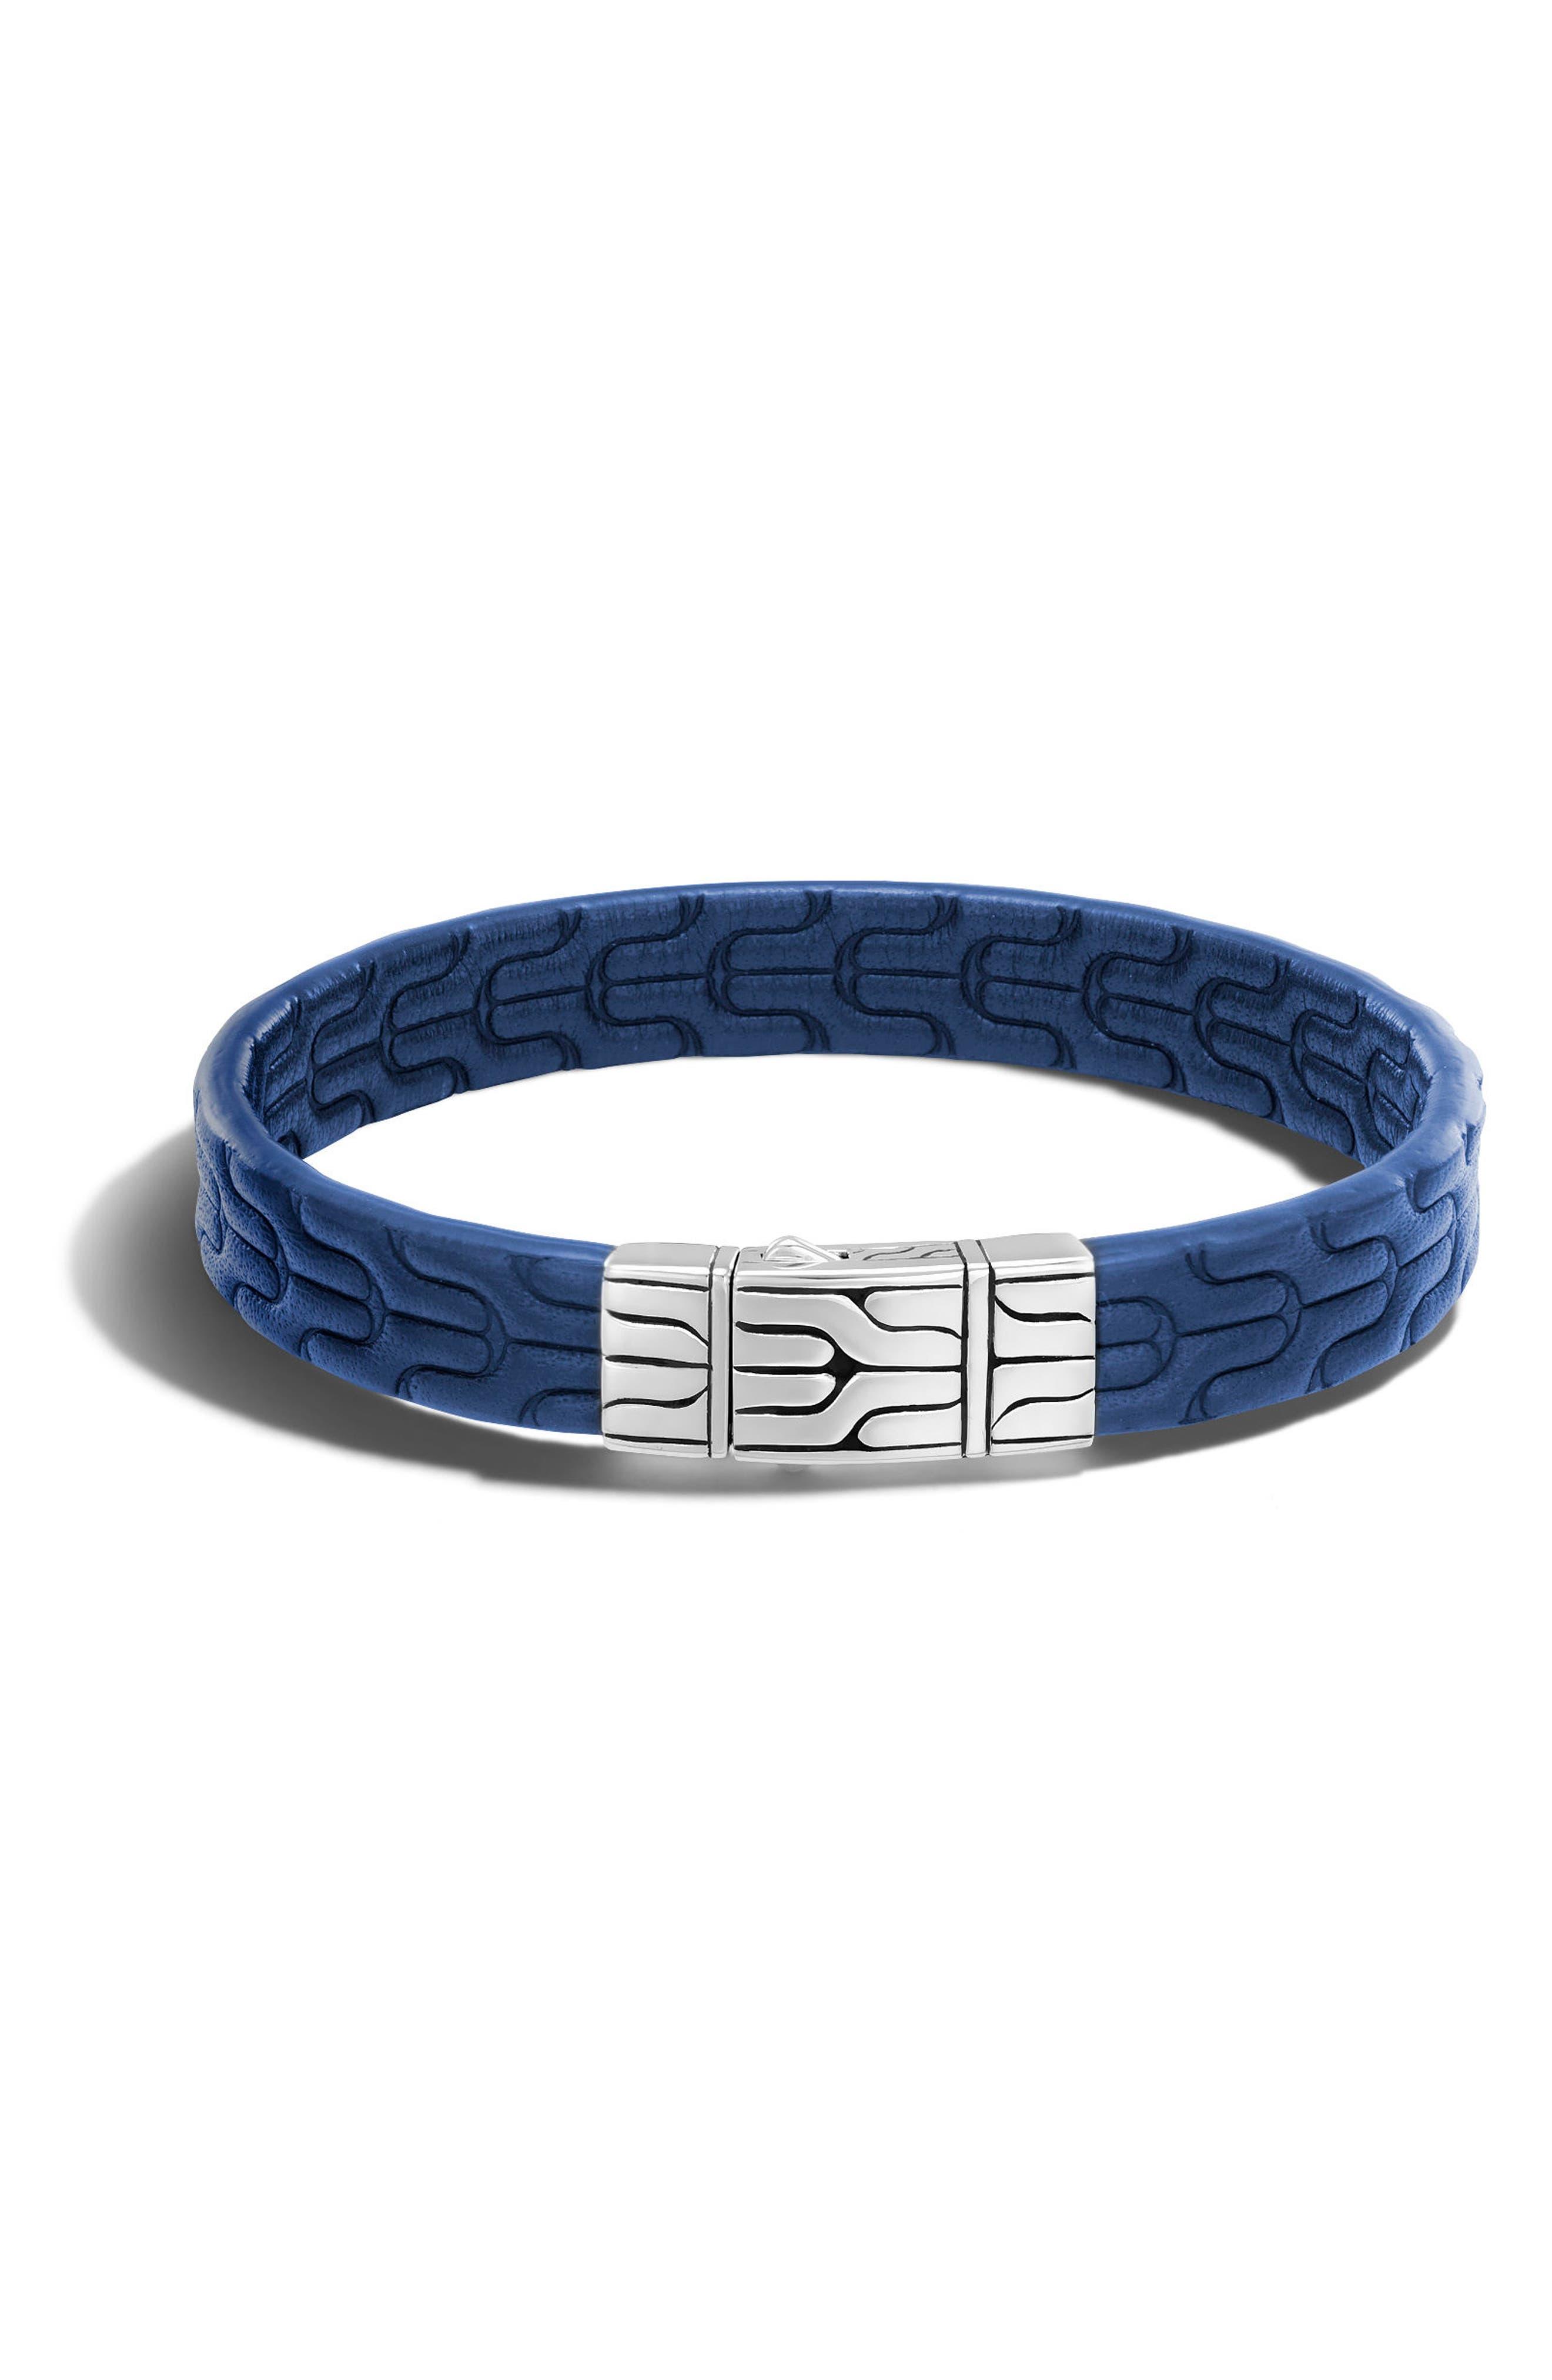 Embossed Leather Bracelet,                         Main,                         color, Silver/ Blue